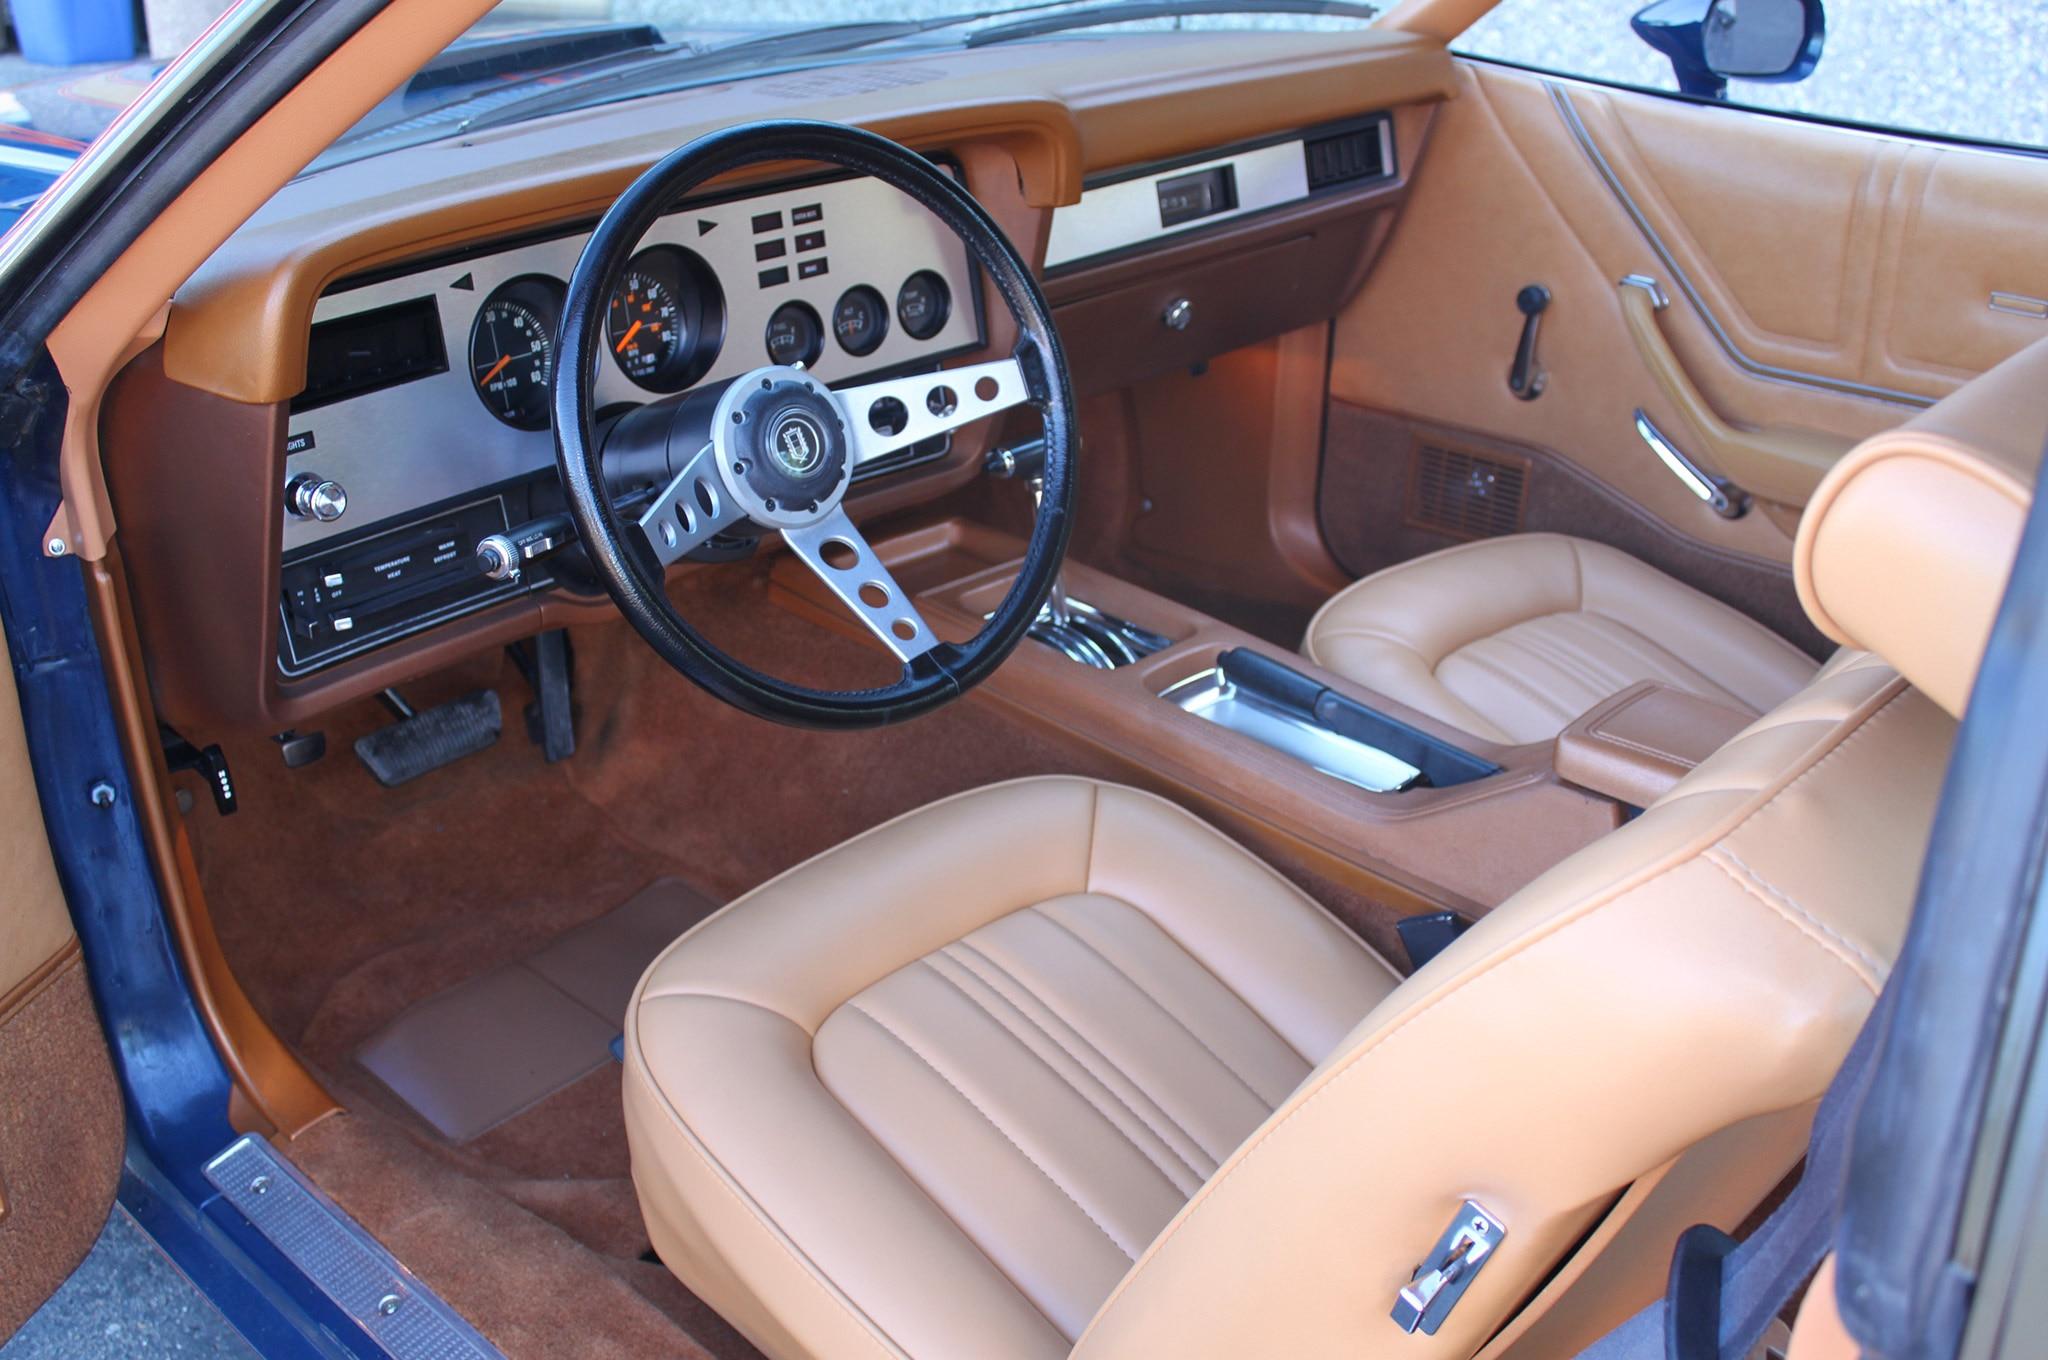 Bobby Aldrich 1978 Mustang II Interior